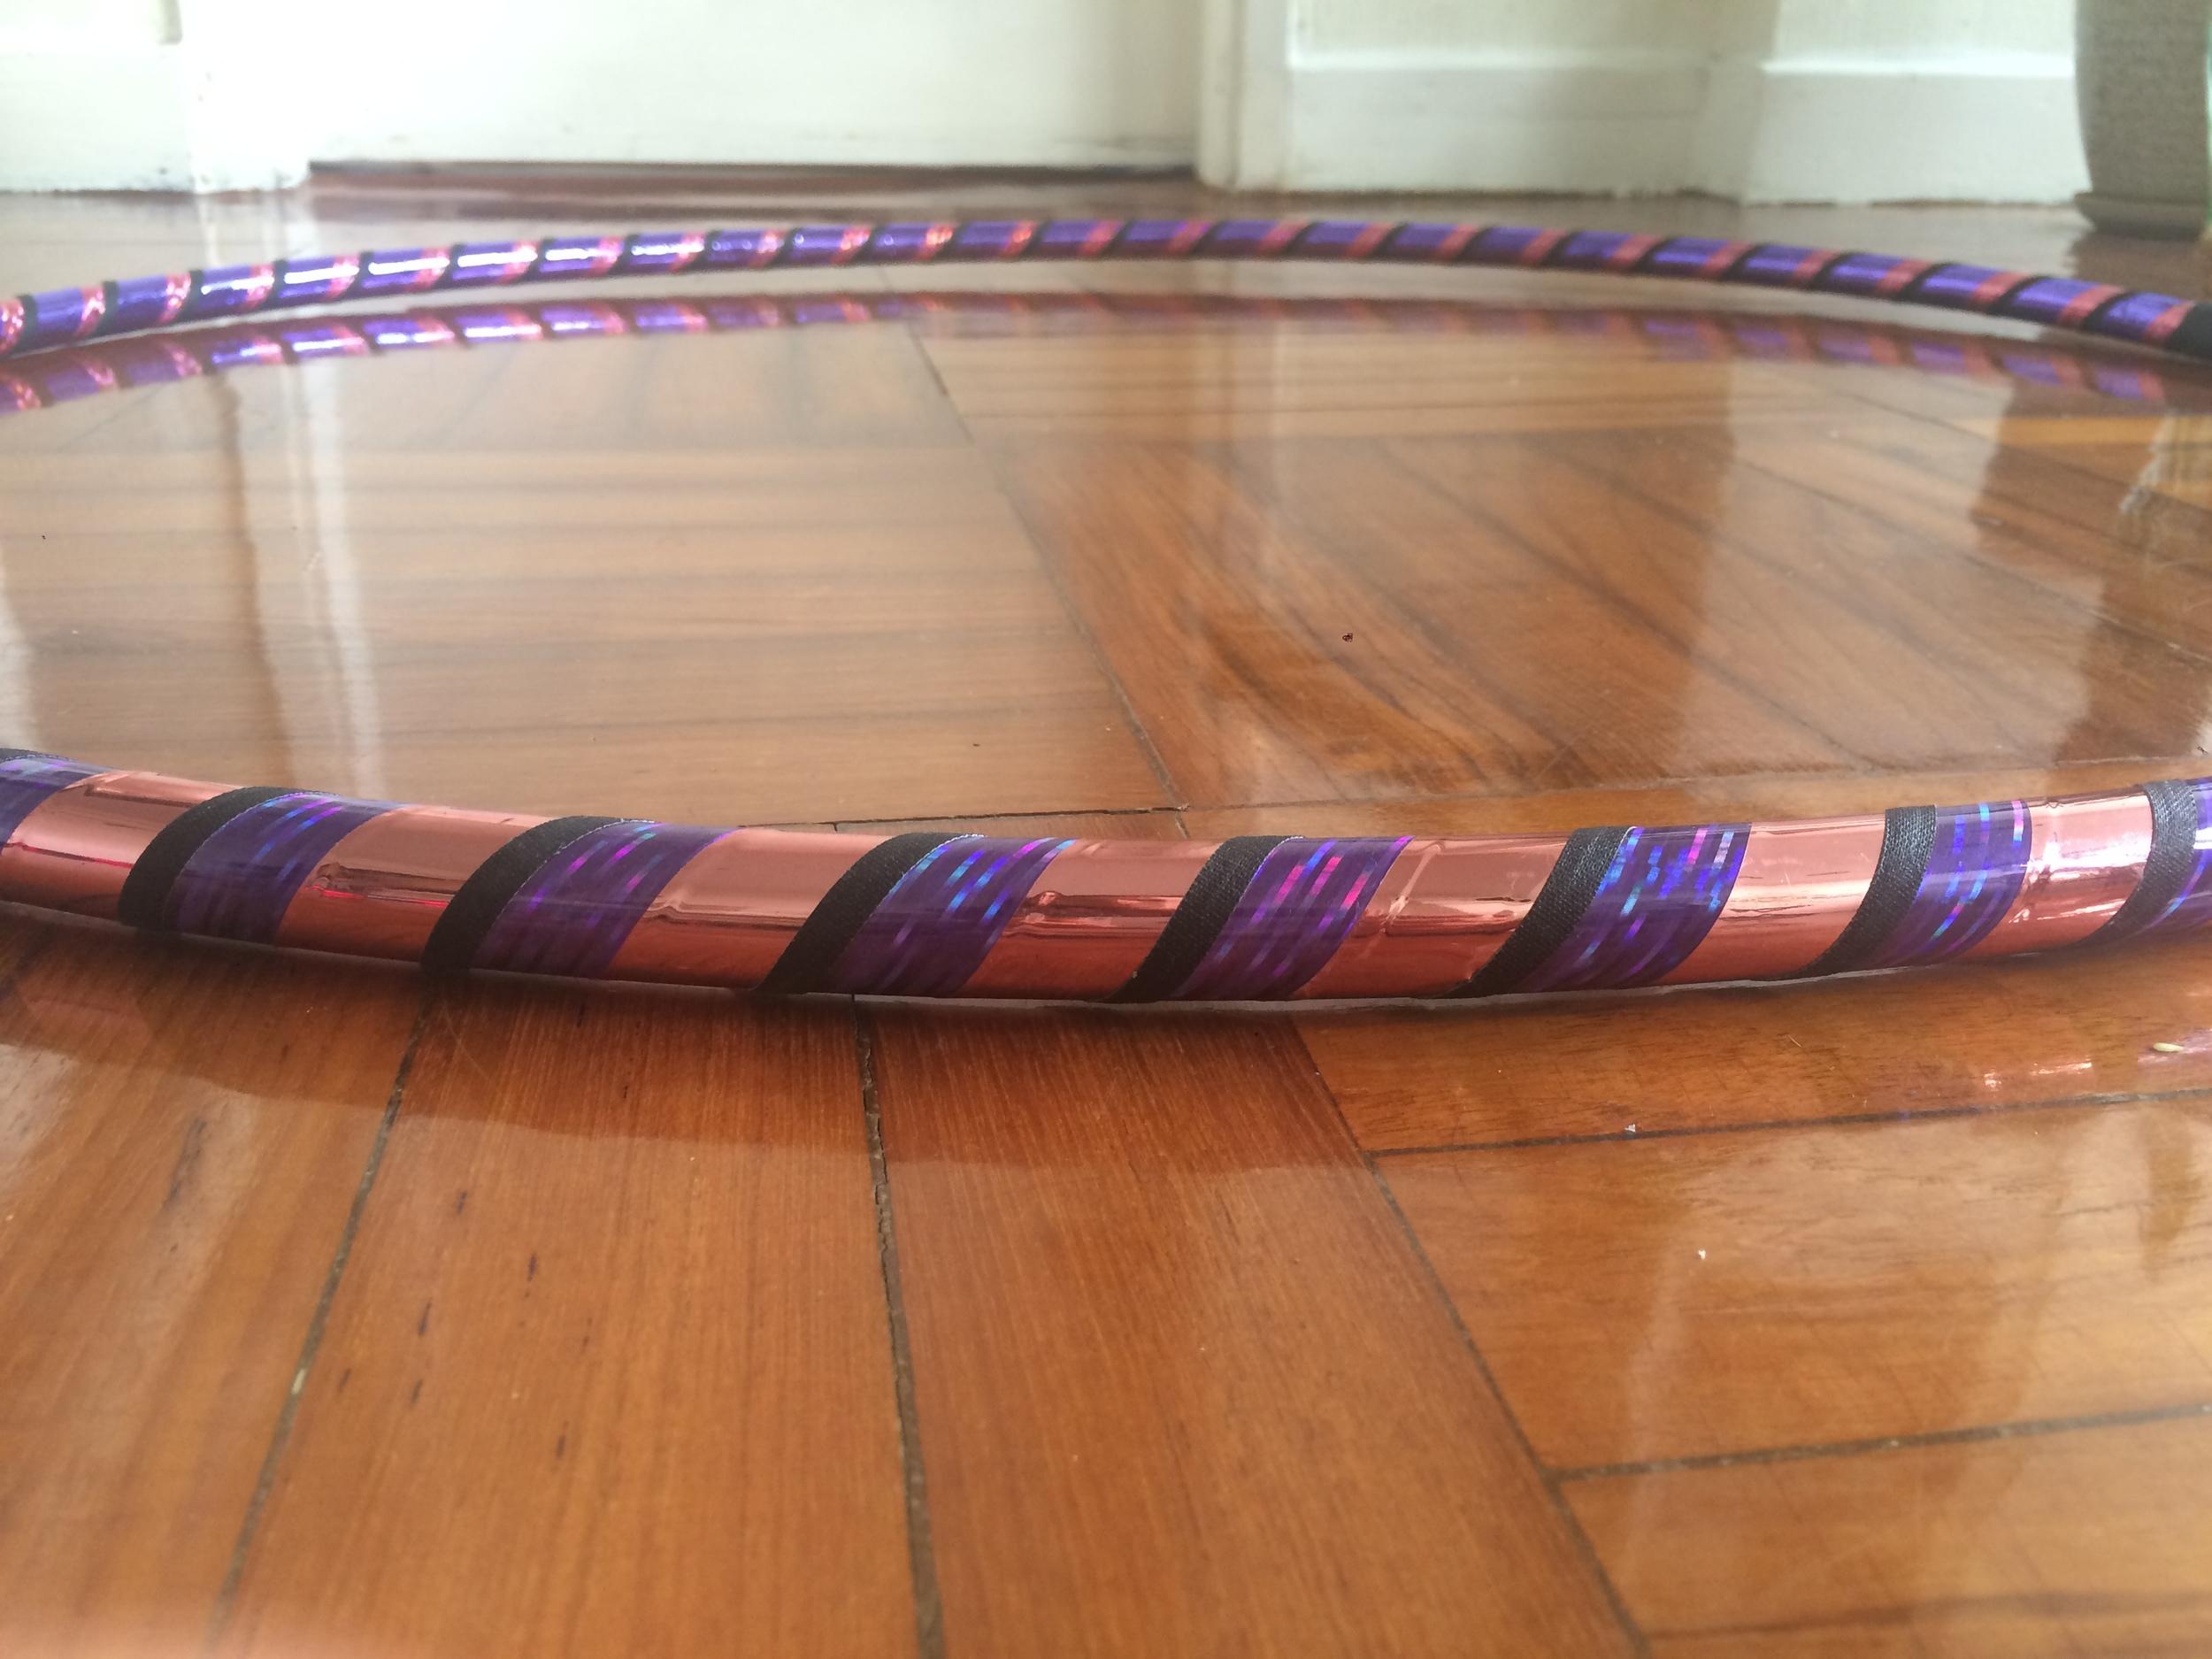 hula hoop for sale 香港呼啦圈售賣